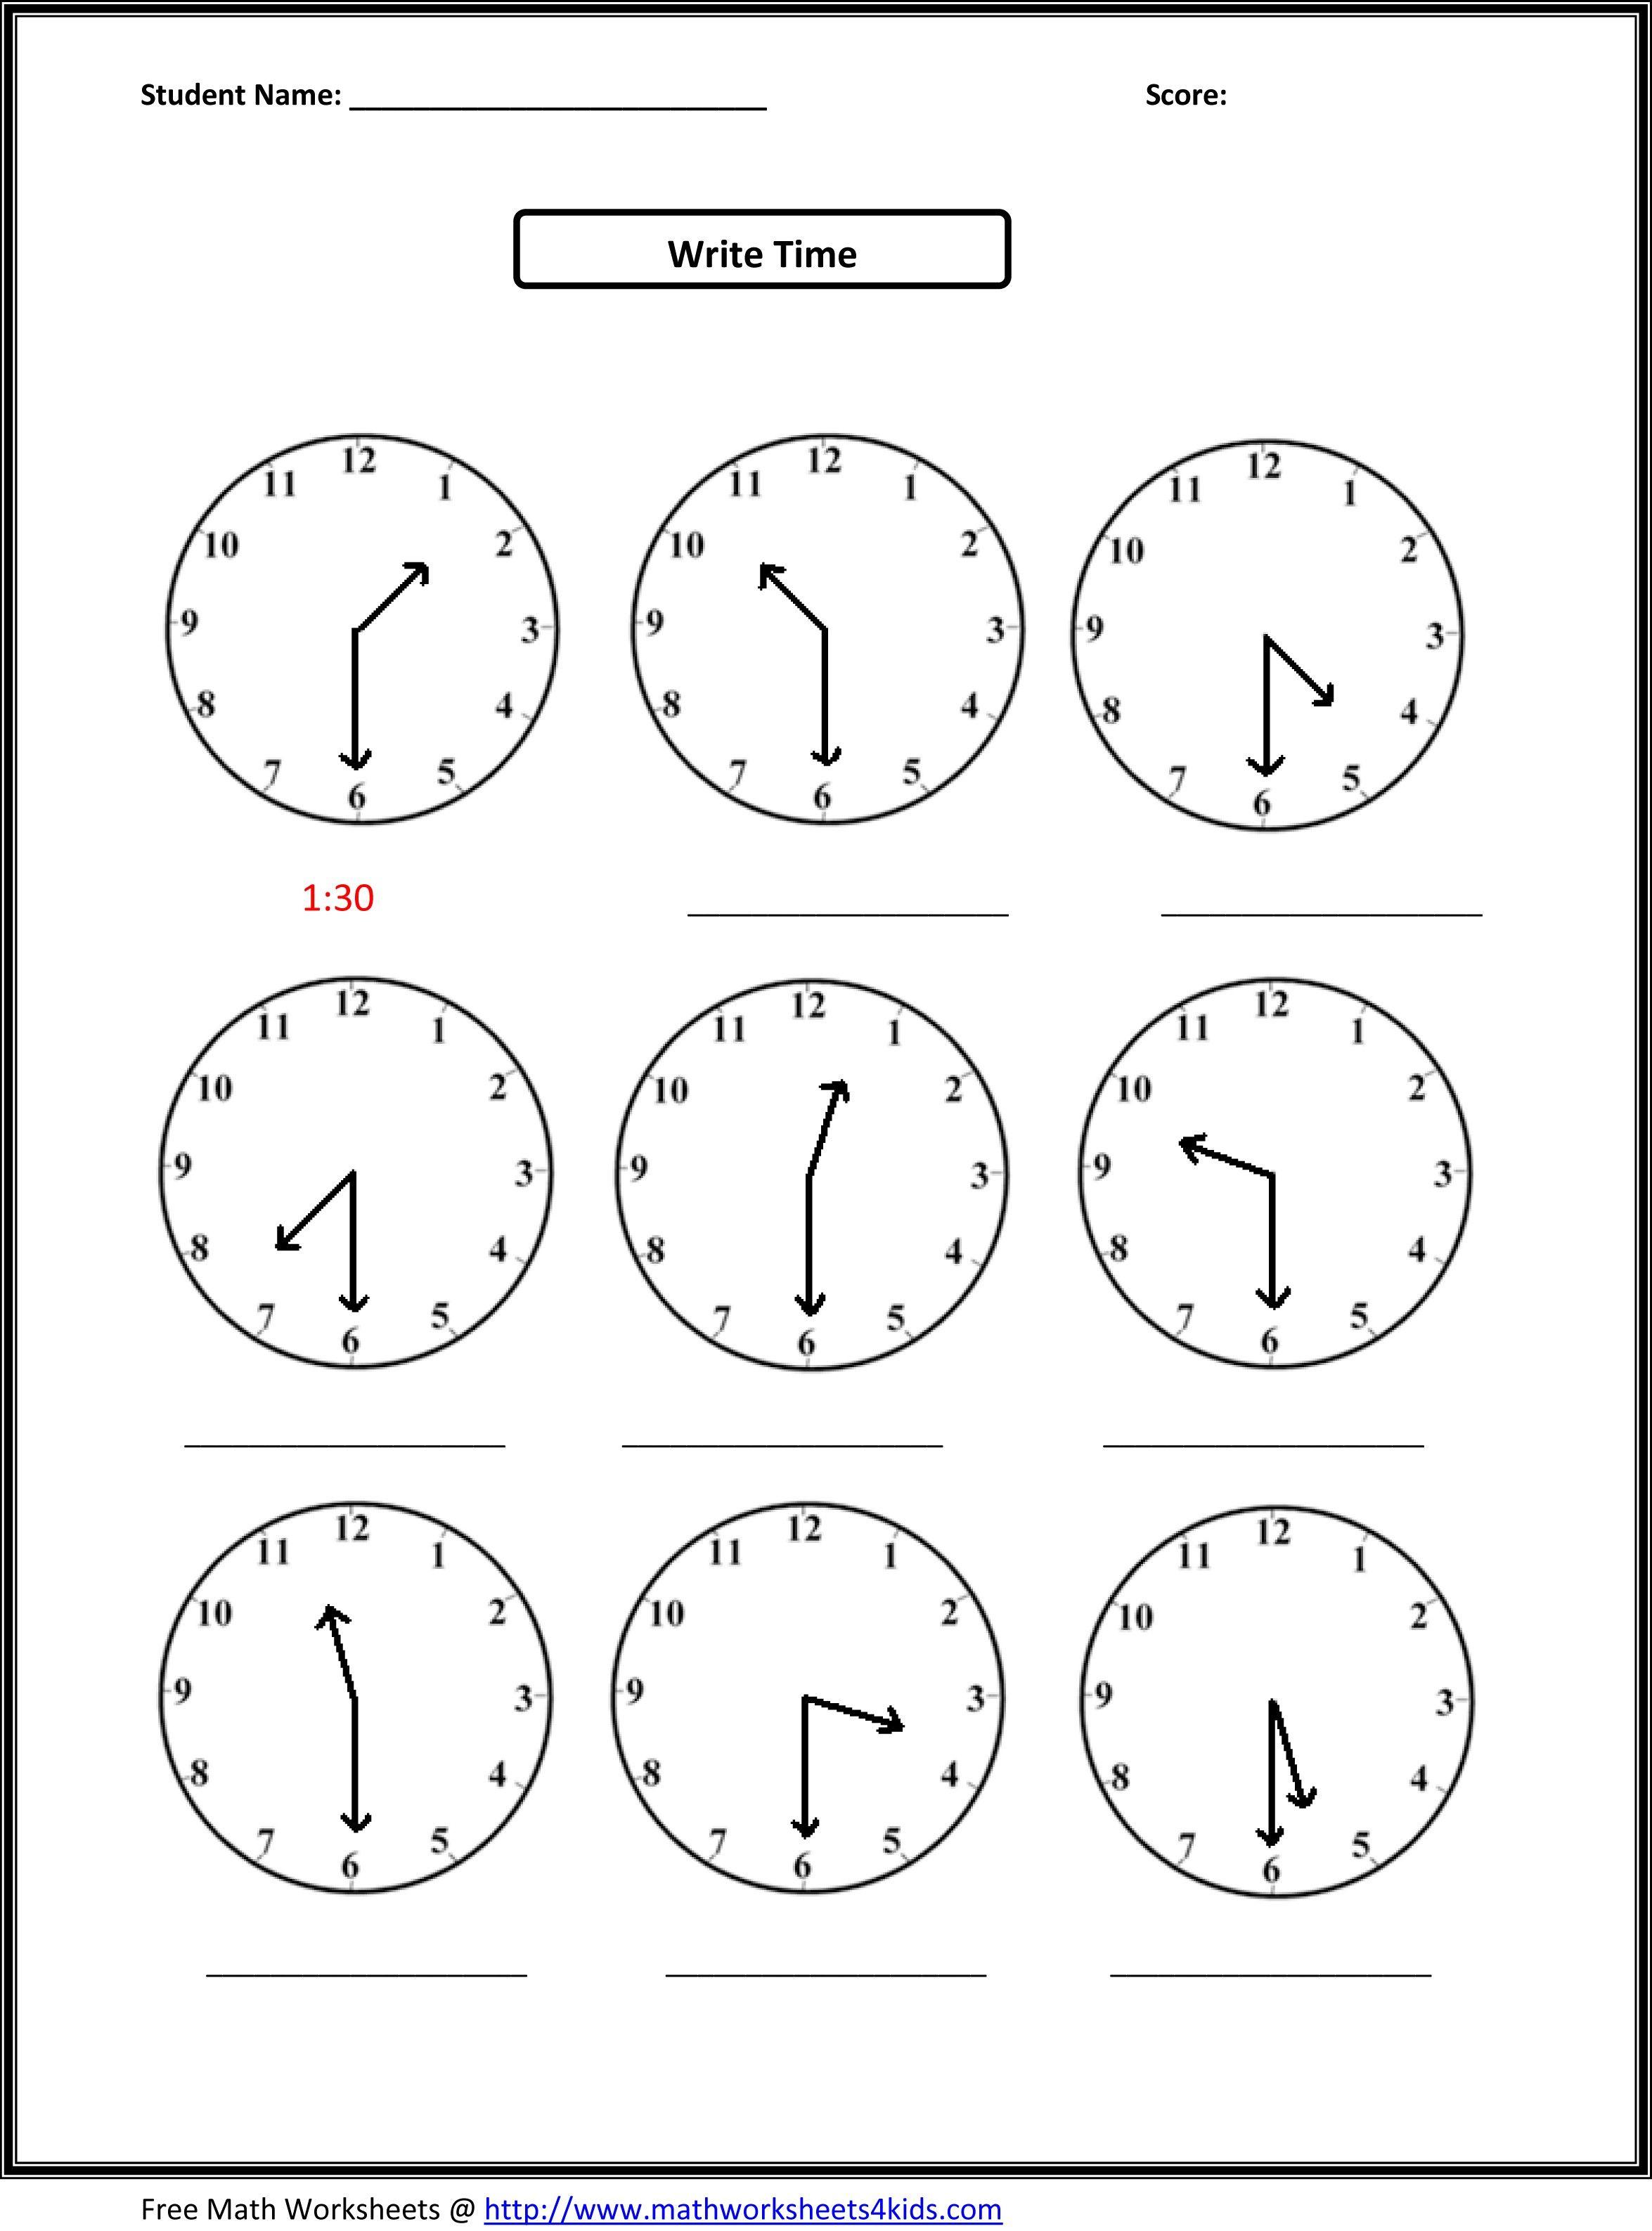 2Nd Grade Free Worksheets Math | Math: Time/measurement | 2Nd Grade | Free Printable Math Worksheets For 2Nd Grade